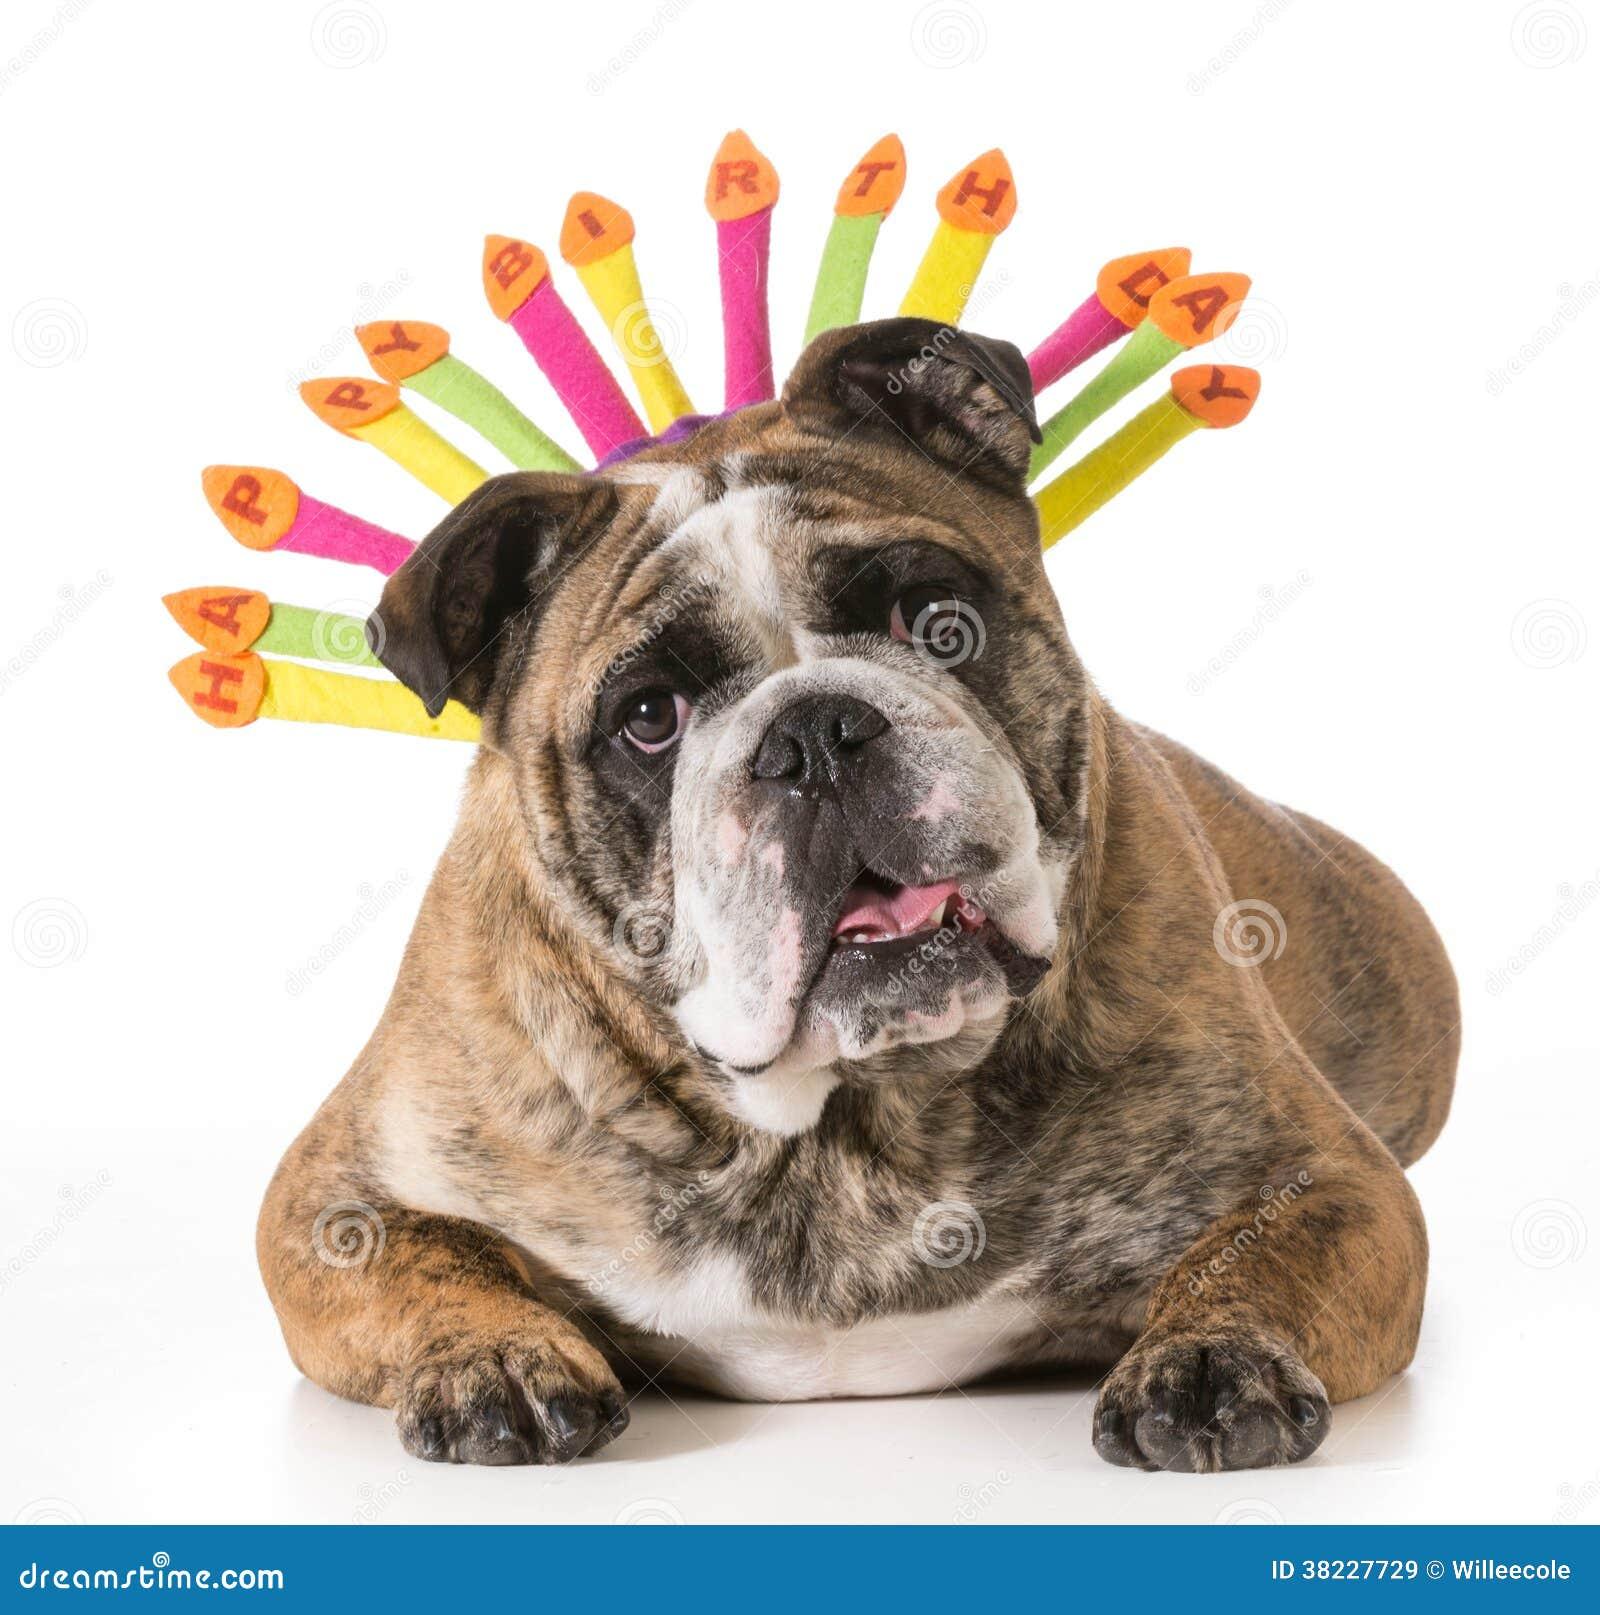 happy birthday dog images free